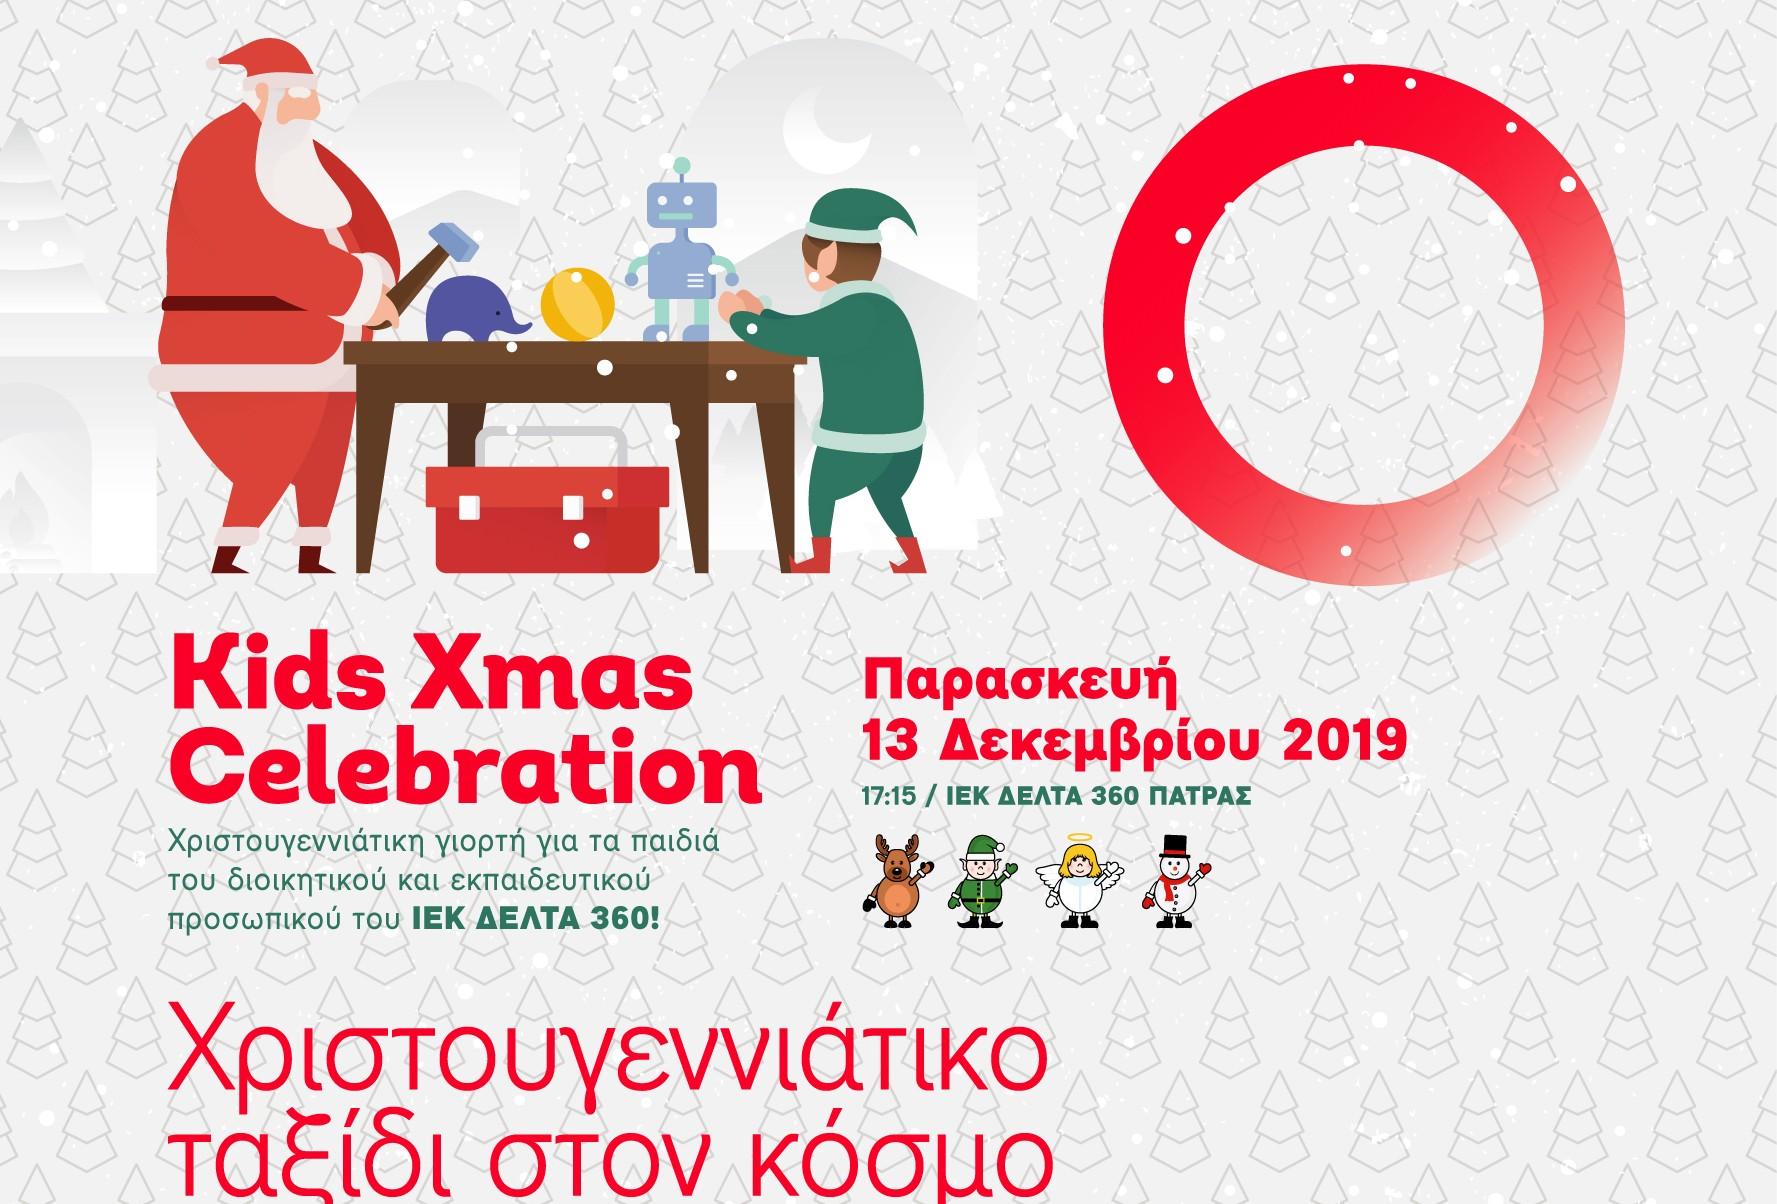 Kids Xmas Celebration - Χριστουγεννιάτικο ταξίδι στον κόσμο!